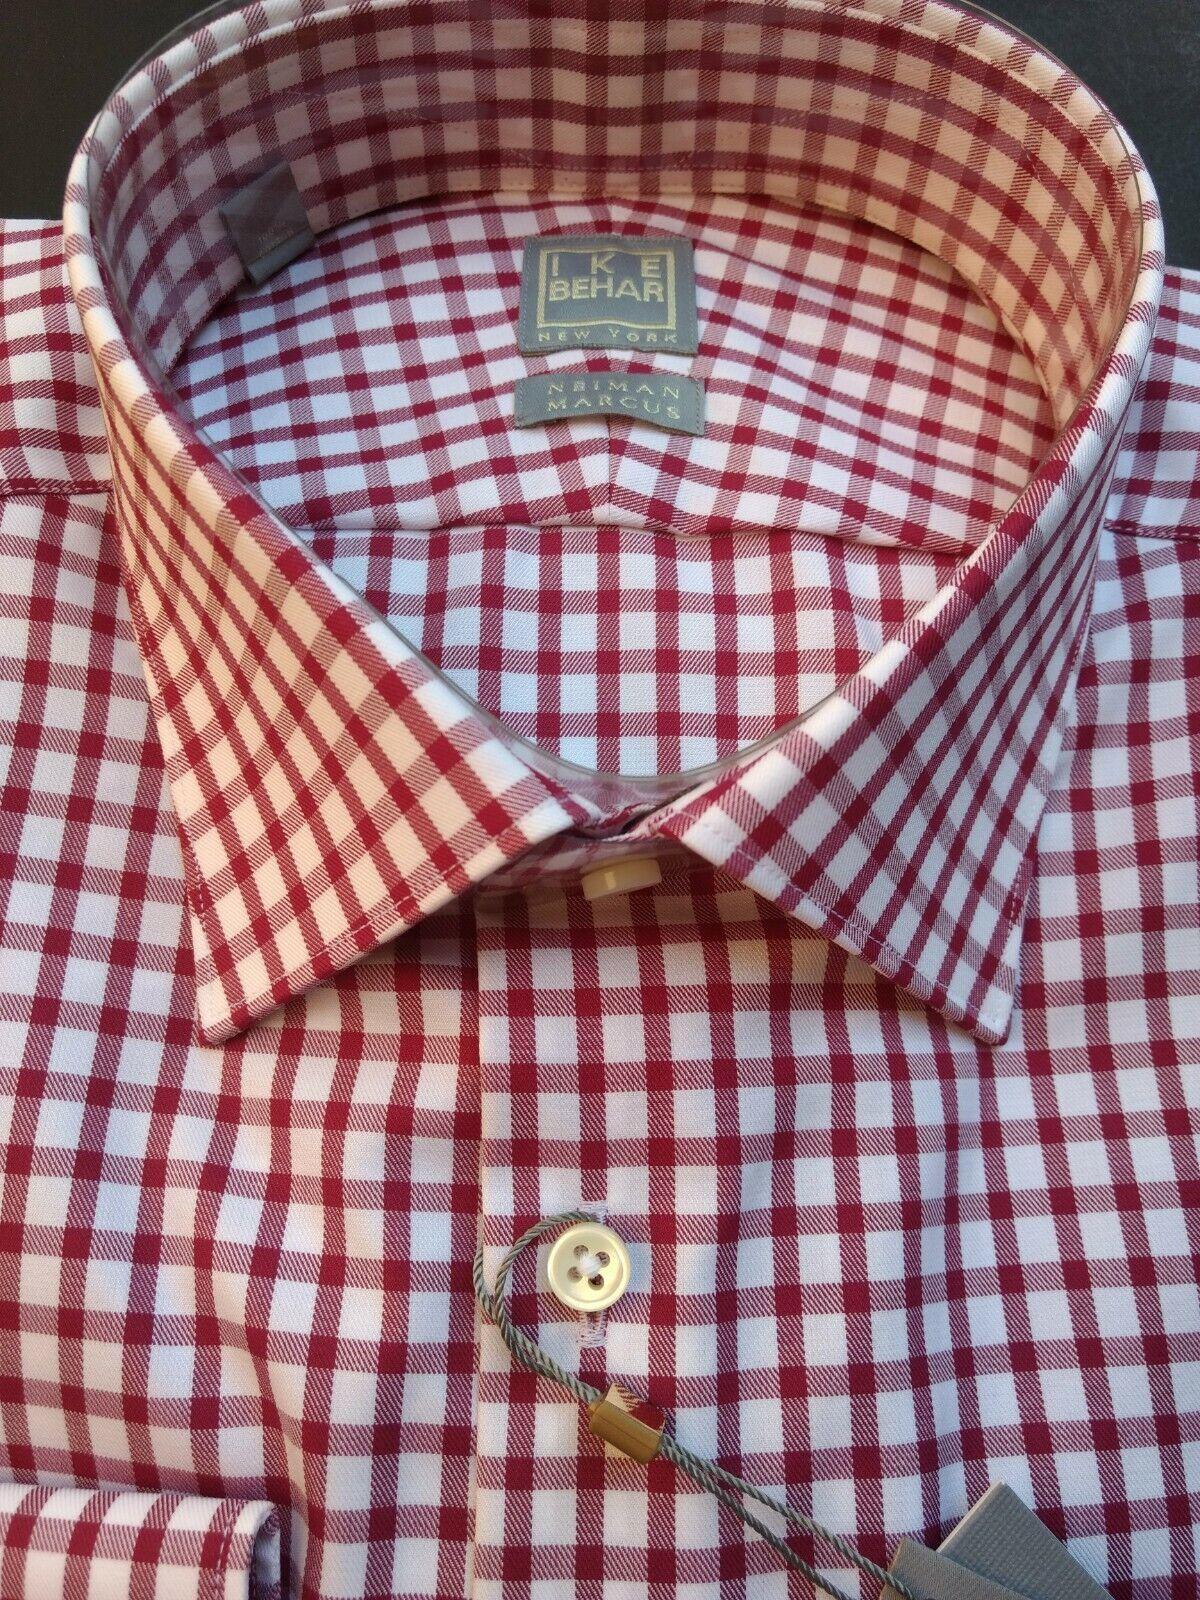 gold LABEL Ike Behar Neiman Marcus Burgundy Red Shirt 16 1 2 Slim Fit 34 35